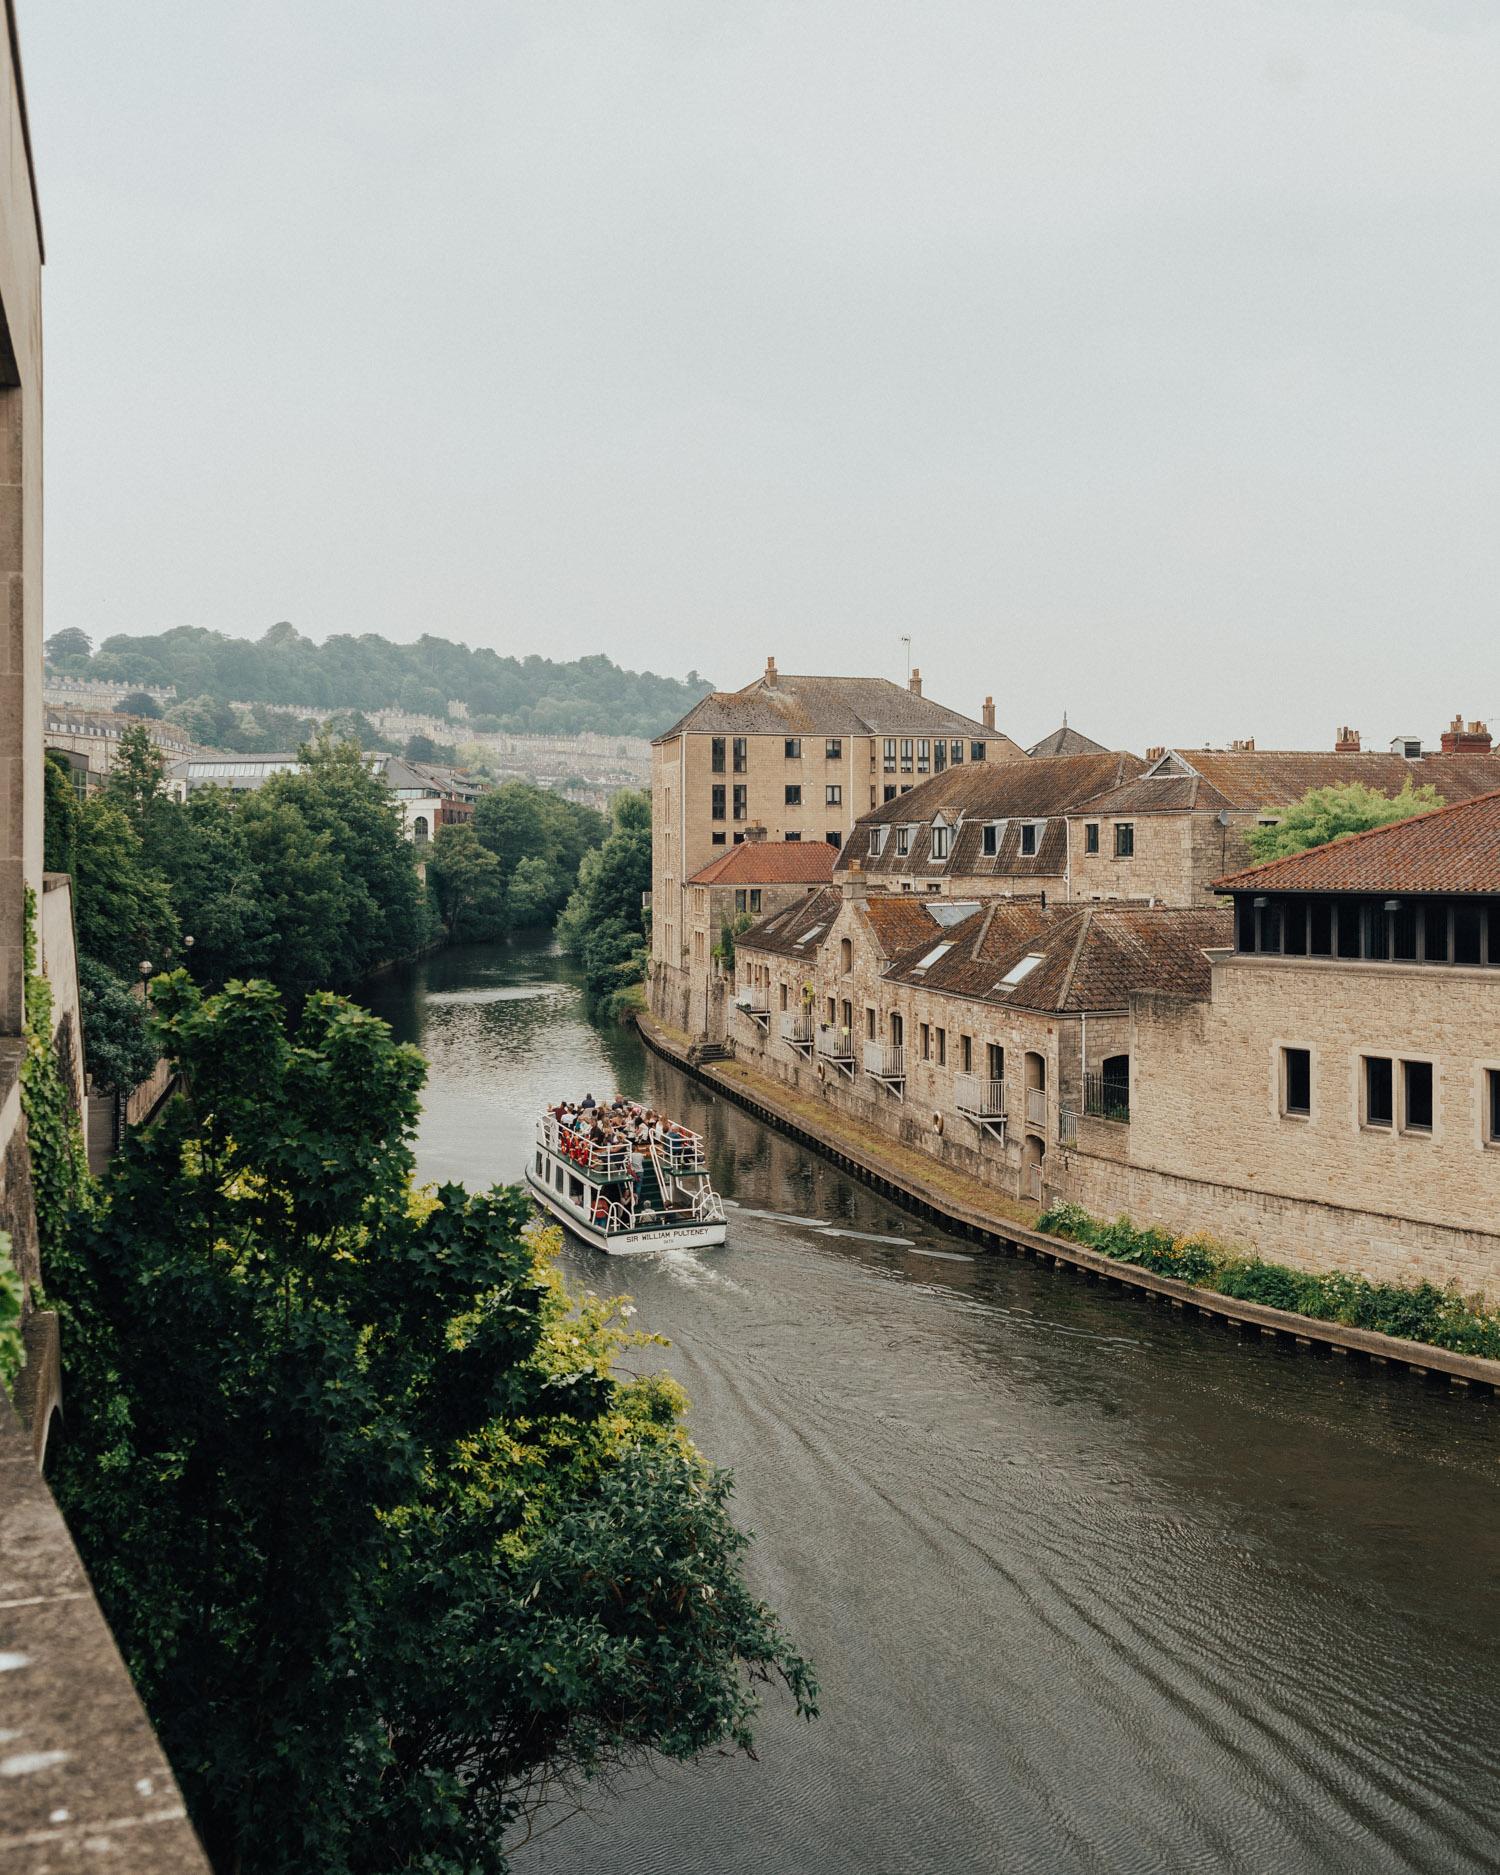 River in Bath, UK